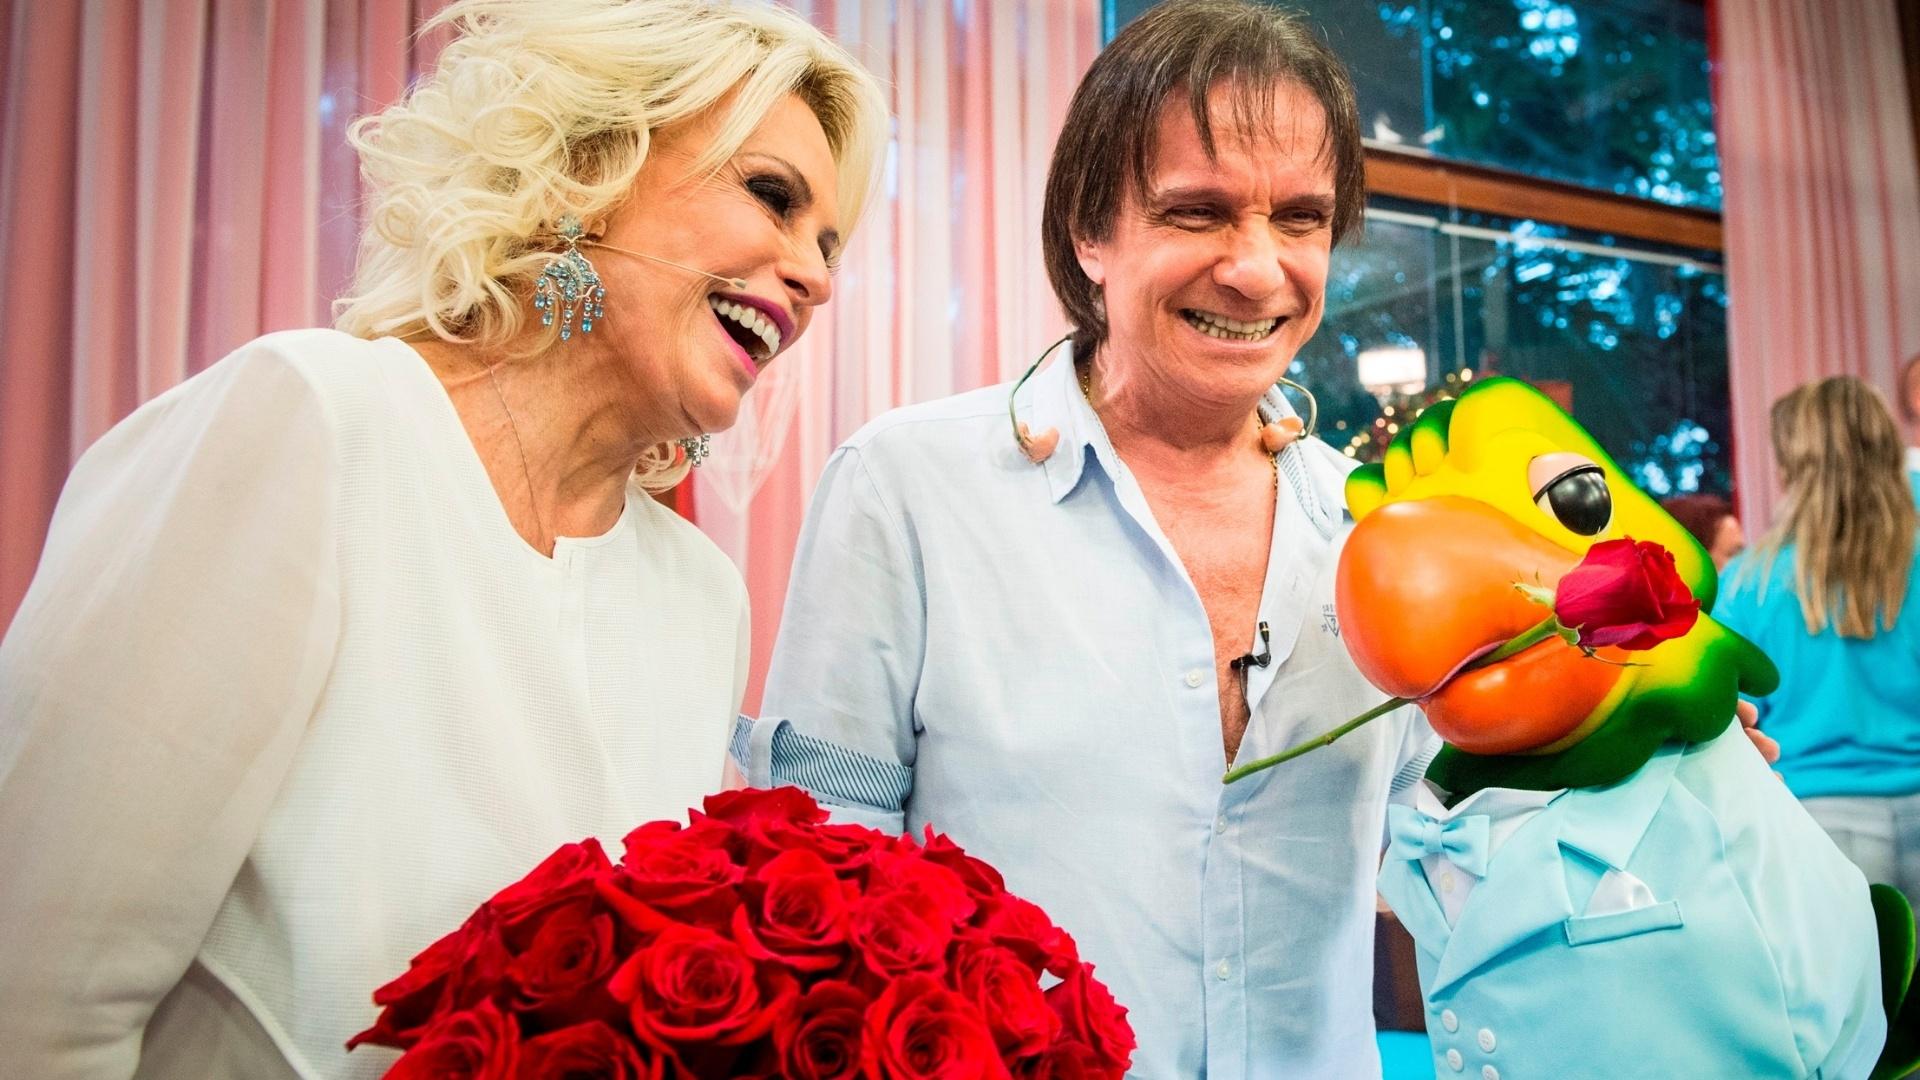 Dez.2015 - Roberto Carlos participa do programa